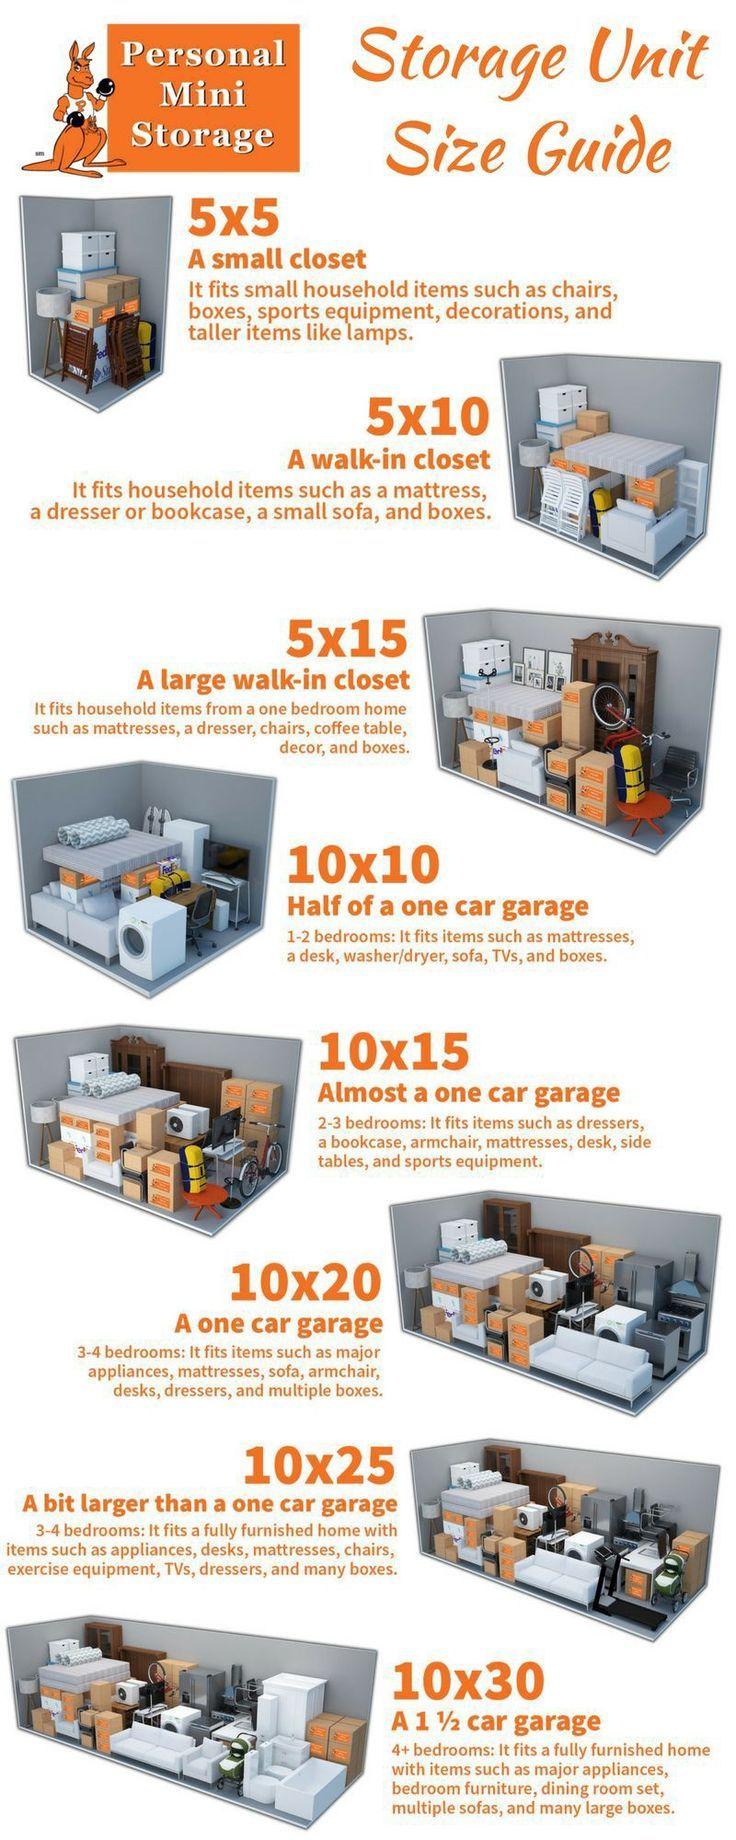 Pin By Jagan Kakvipure On Moving Buying Selling Home Storage Unit Organization Self Storage Units Storage Unit Sizes